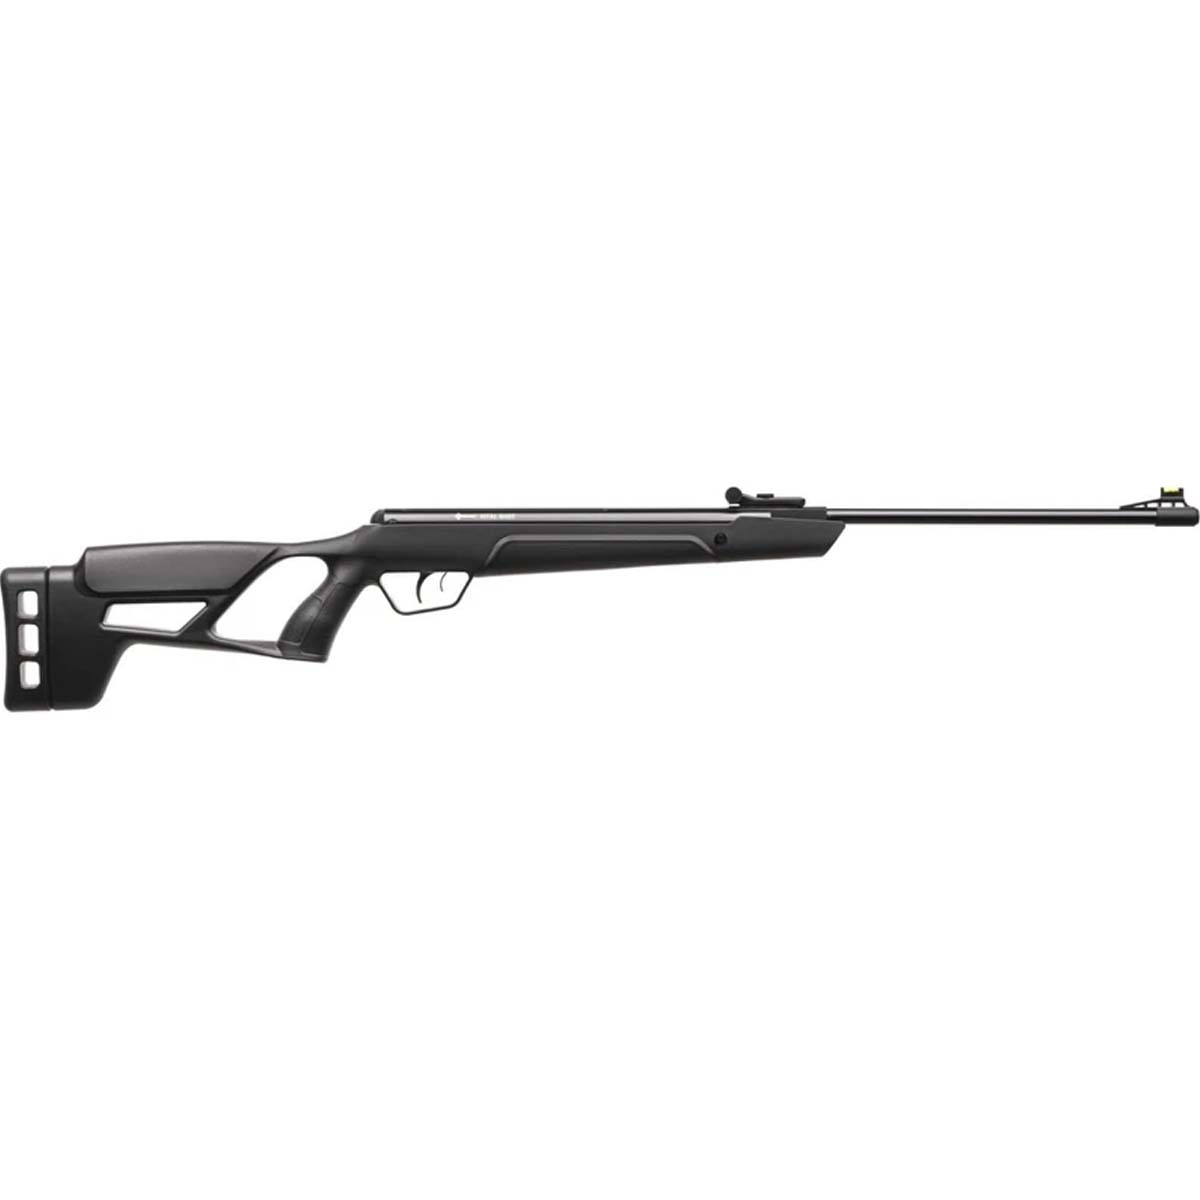 Rifle De Resorte Calibre 5.5MM Tiro Blanco Deportivo Crosman